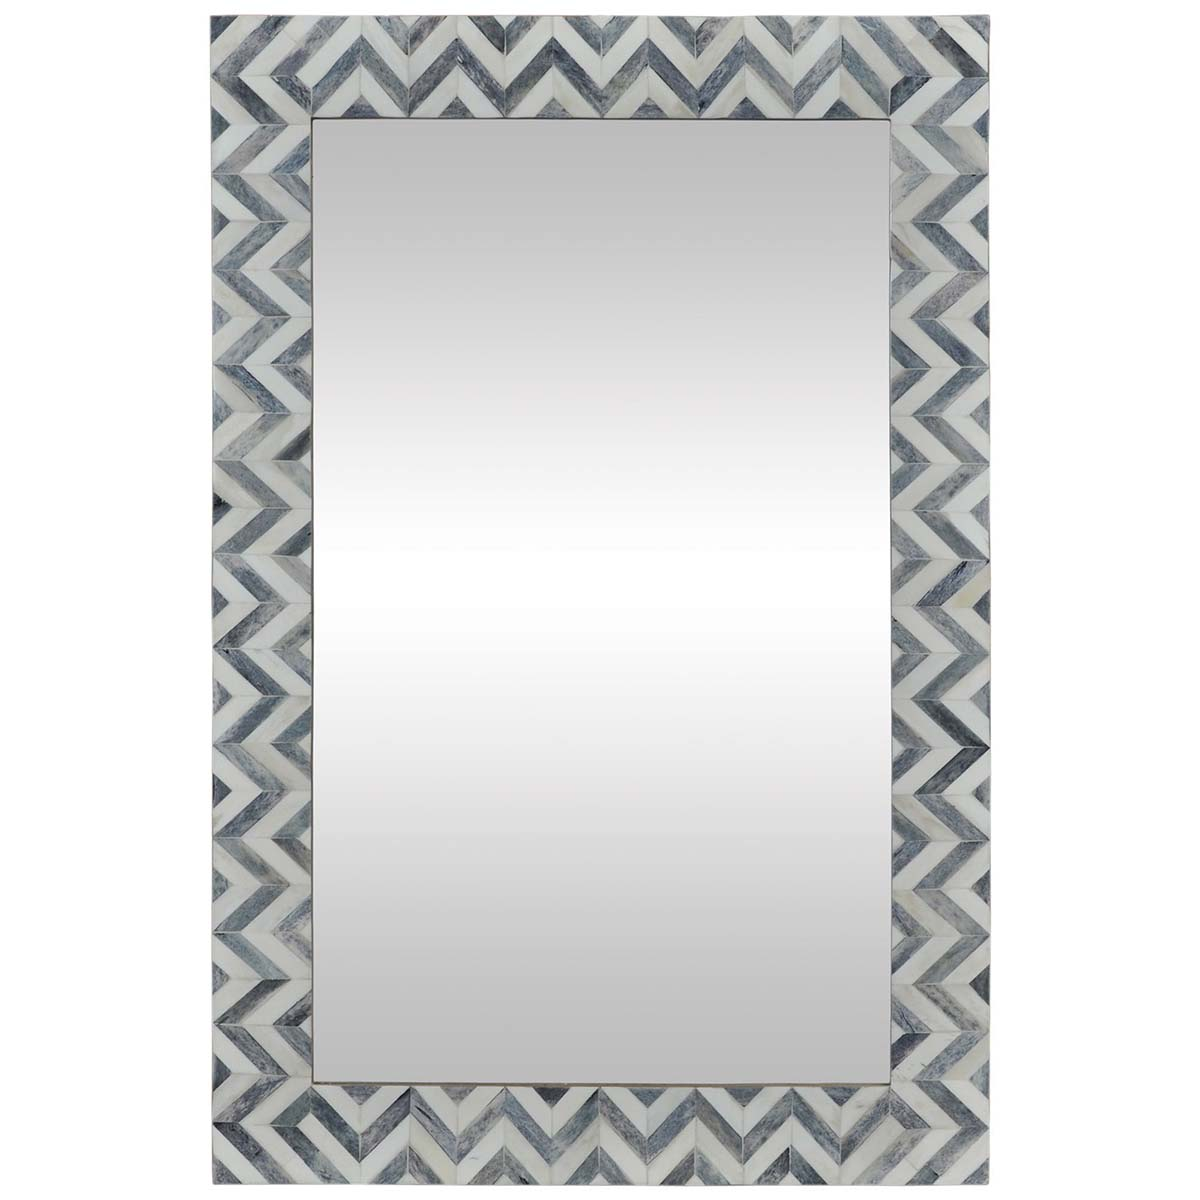 Choose Abscissa Mirror 9 2379